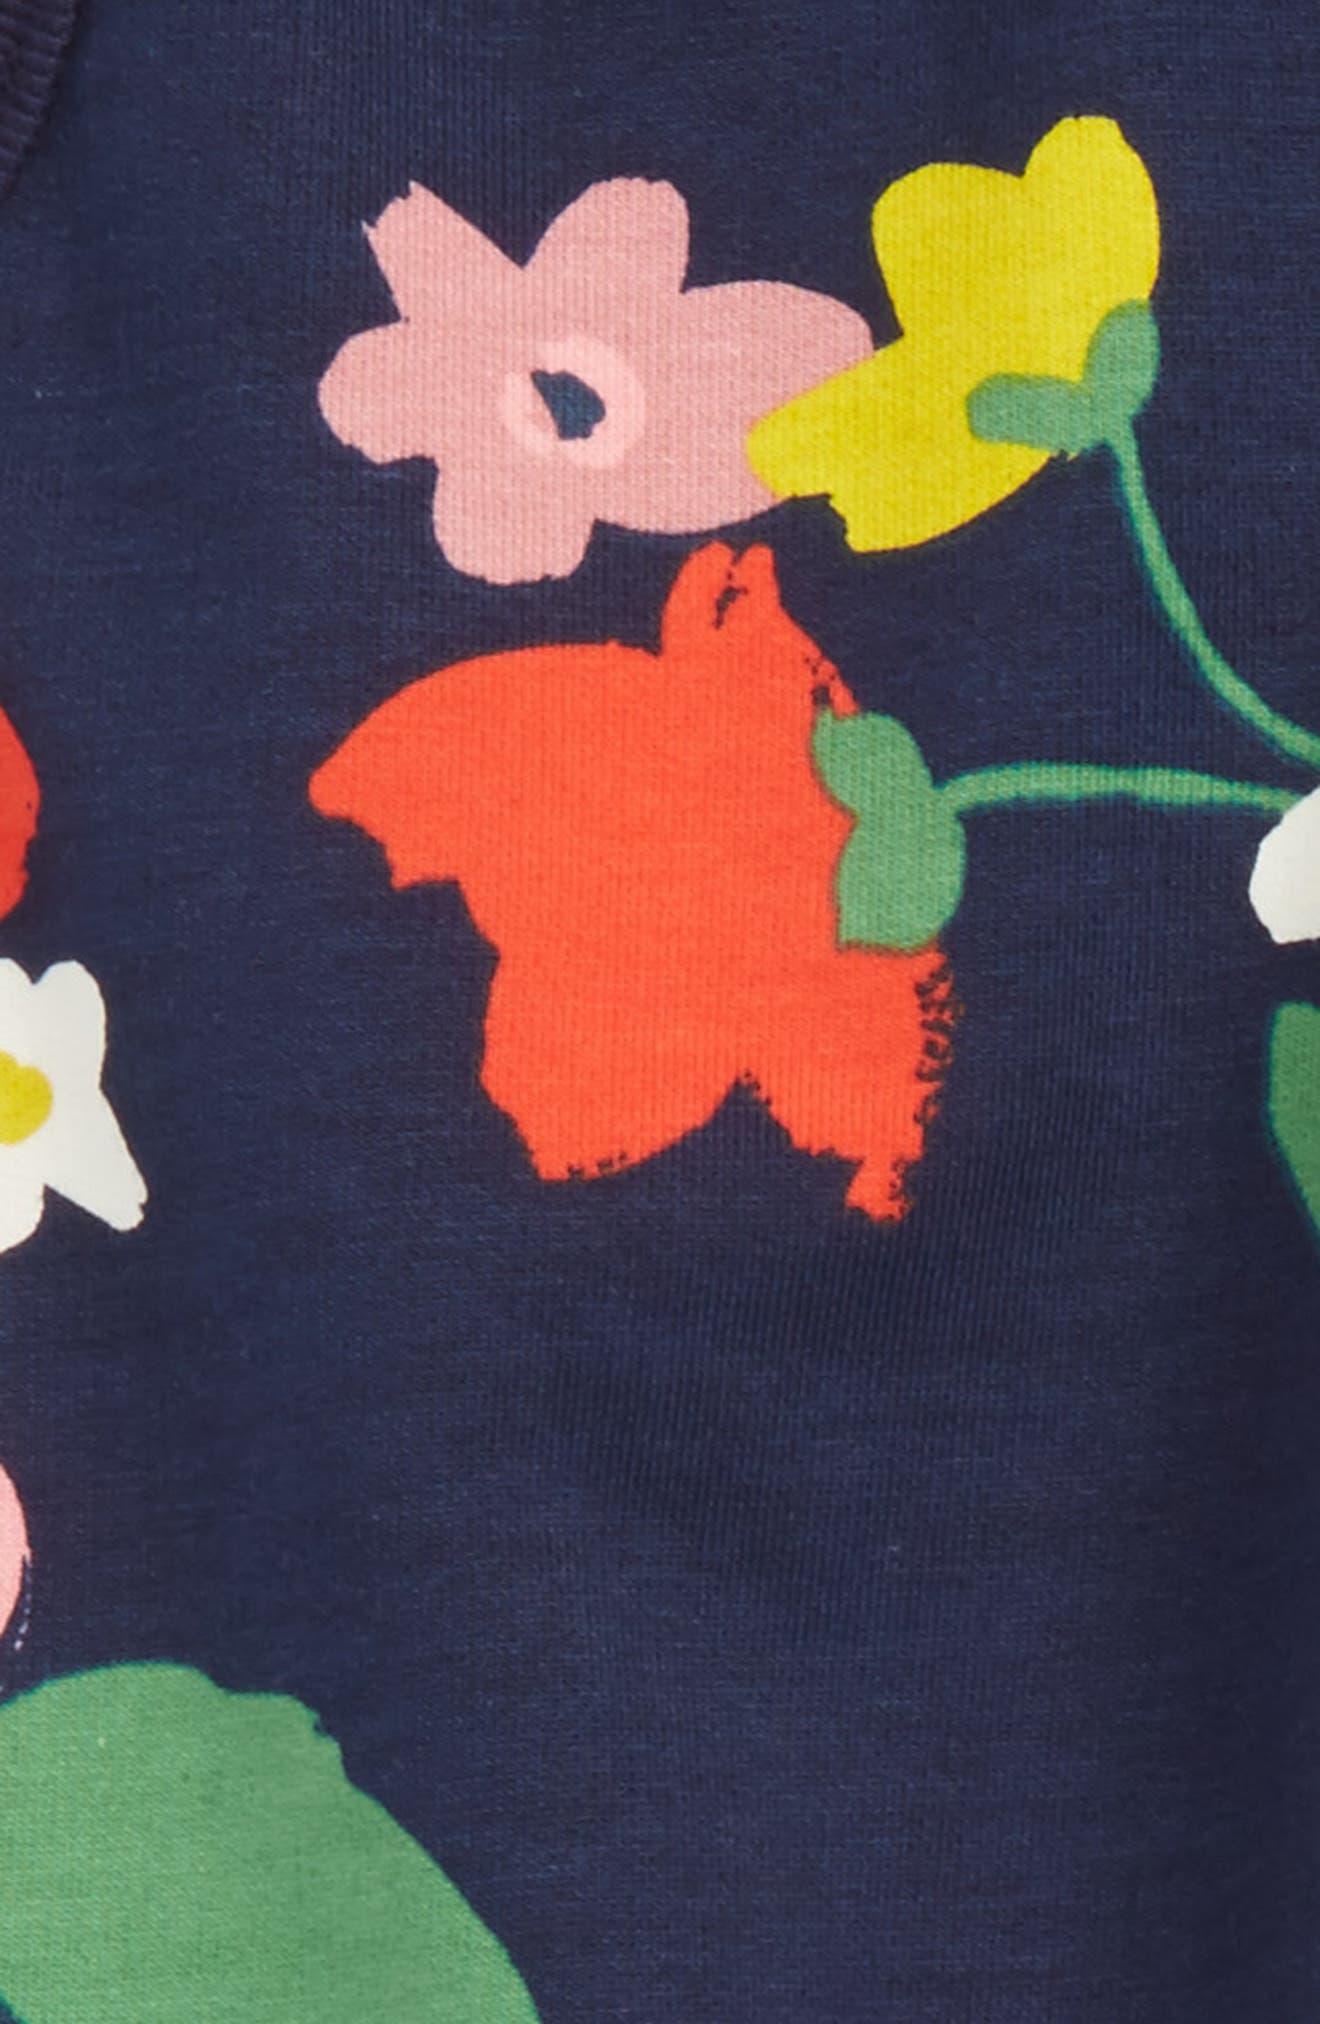 Scotland Gardens Jogger Pants,                             Alternate thumbnail 2, color,                             483